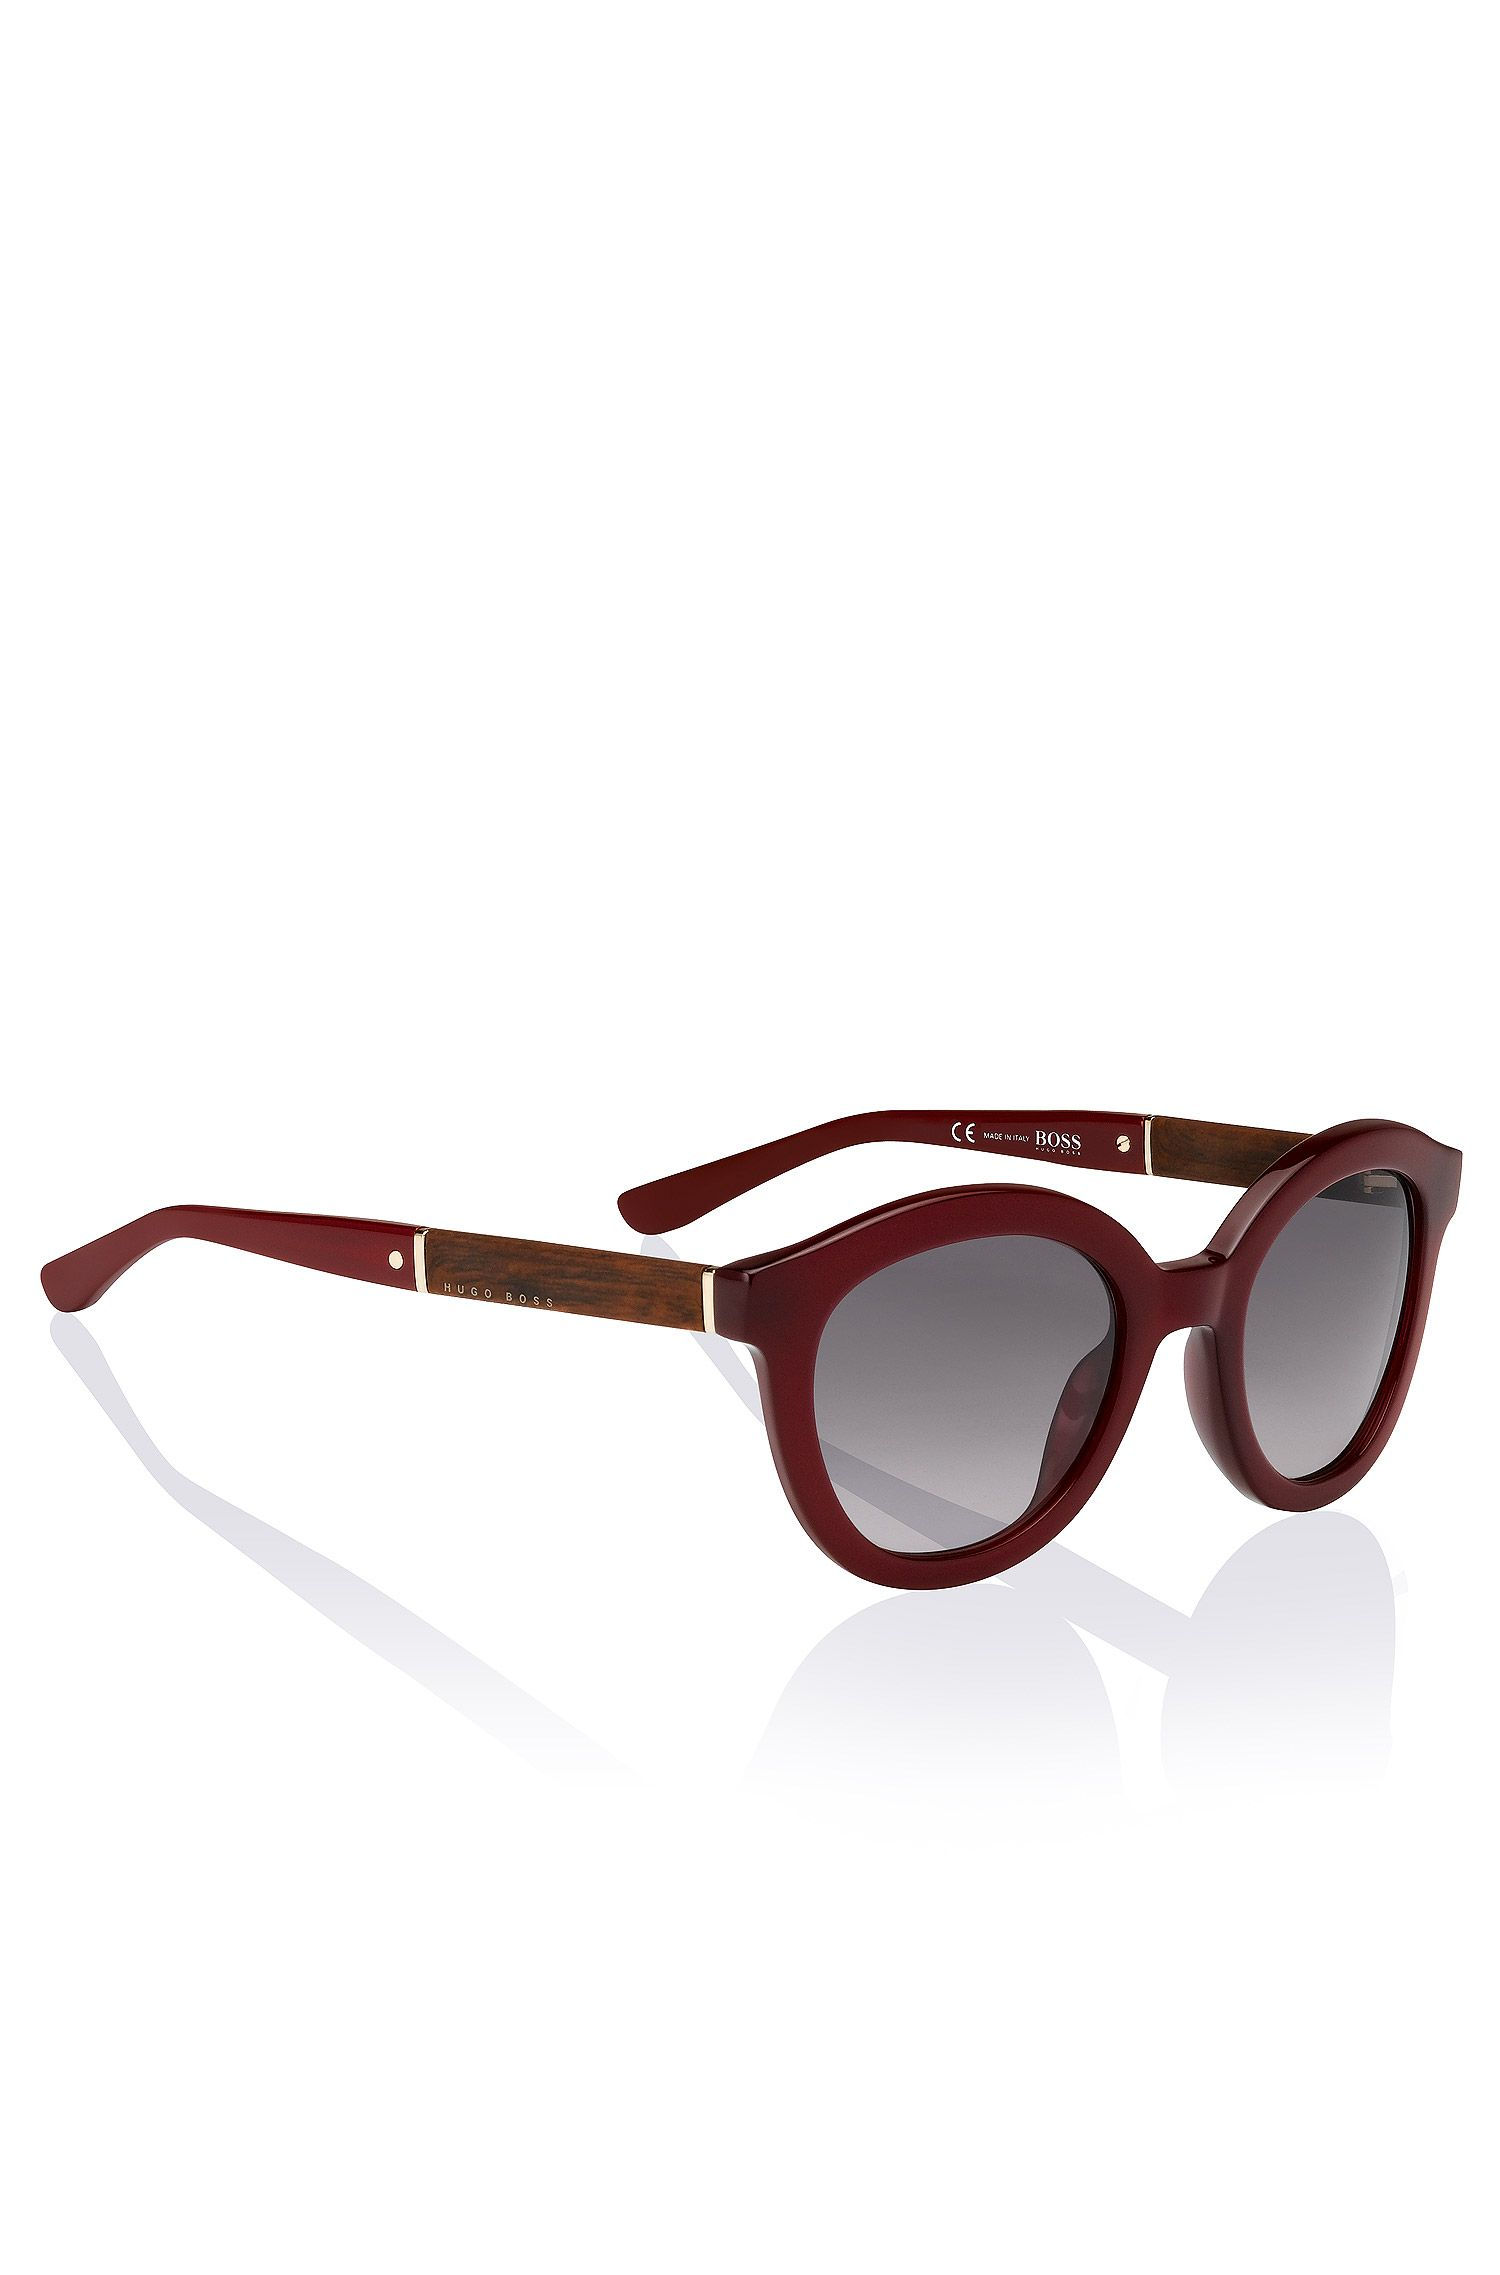 Gafas de sol 'BOSS 0662/S' en acetato